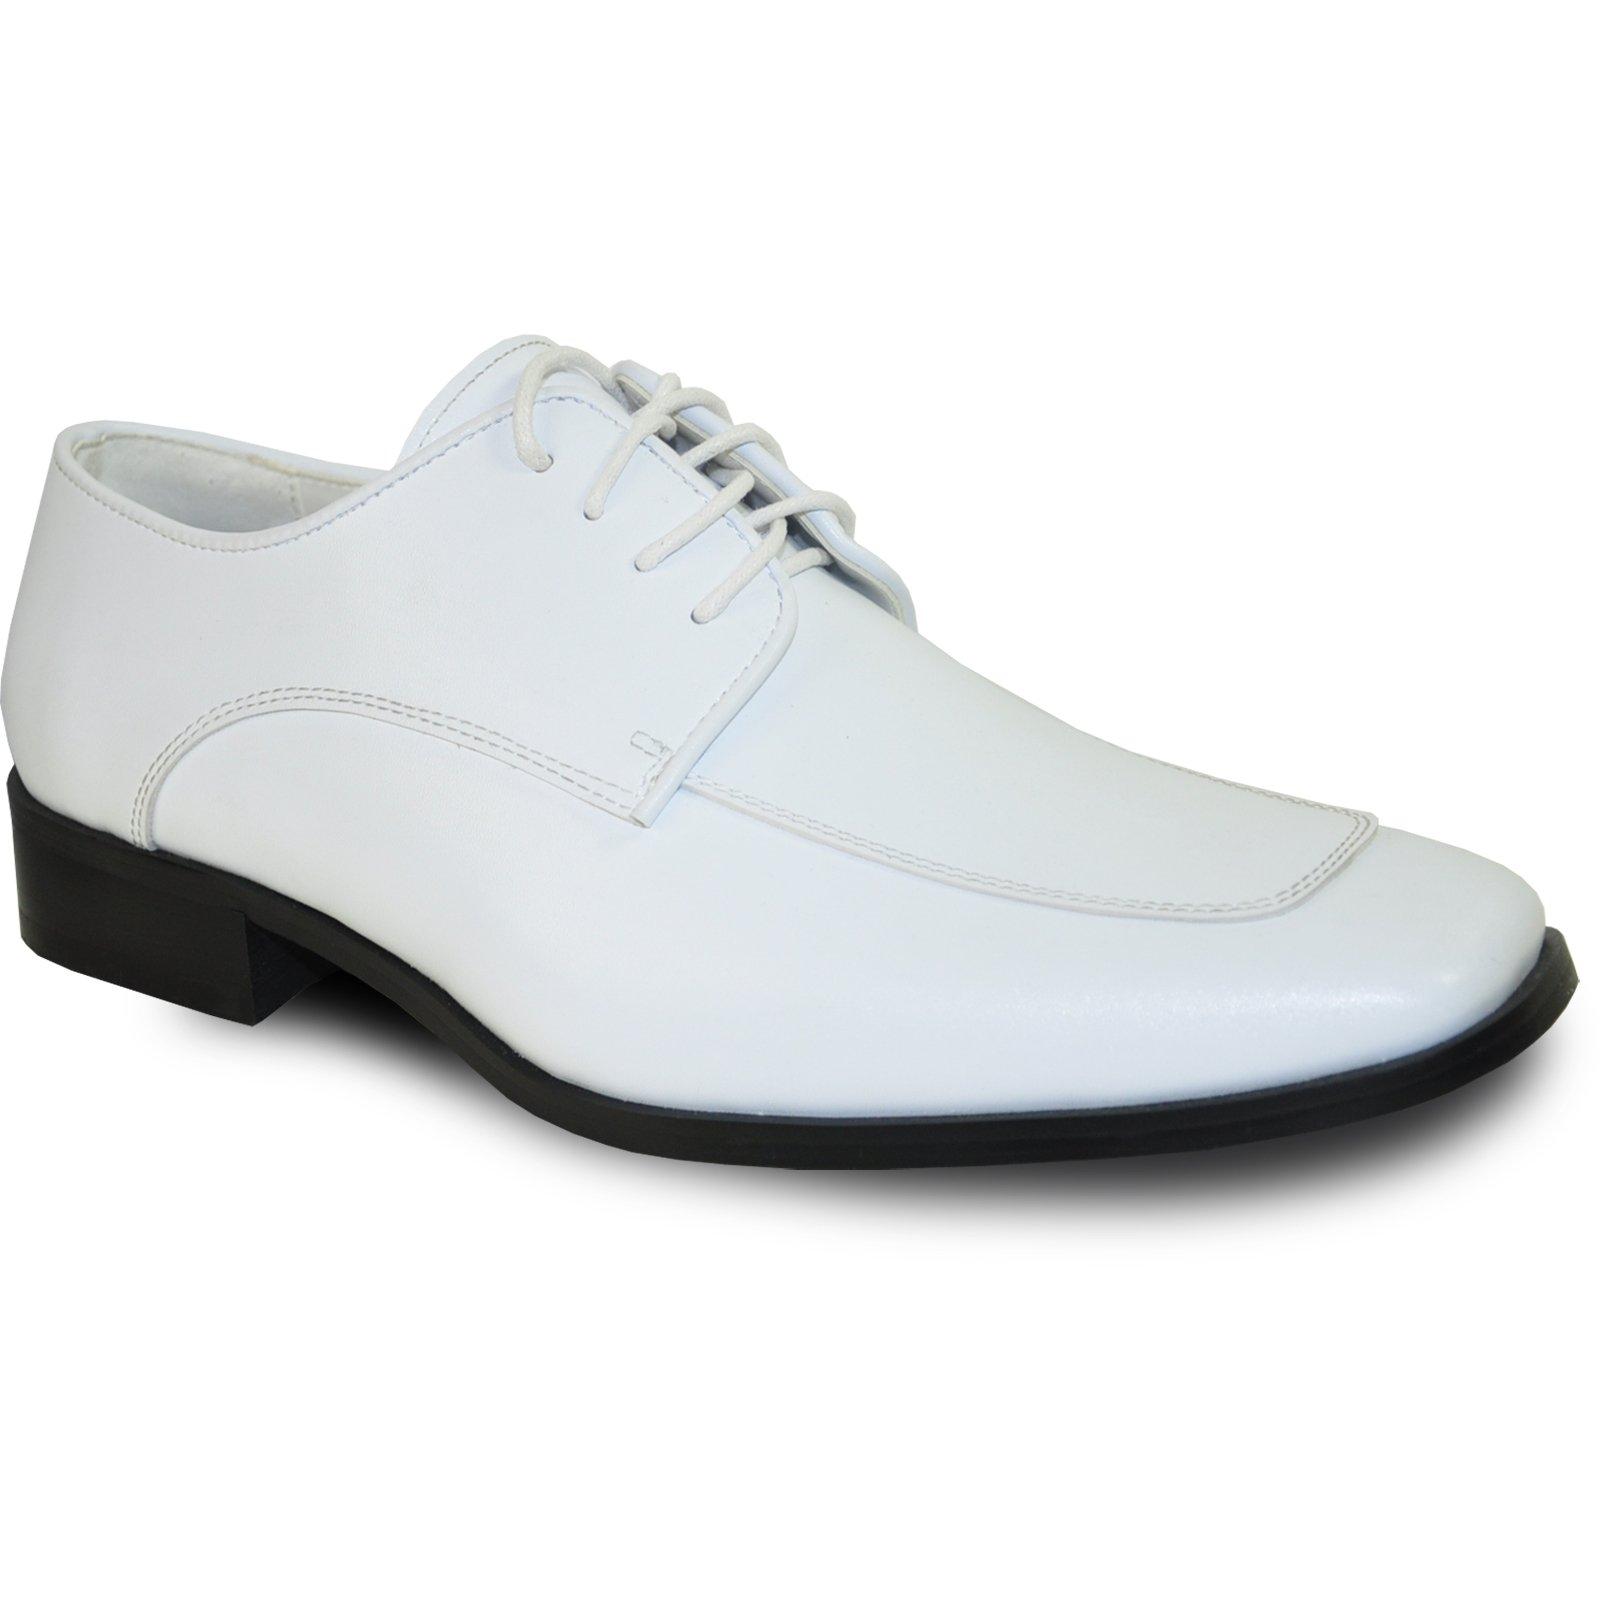 VANGELO Men Tuxedo Shoe Tux-3 Square Toe for Wedding, School Uniform & Formal Event-Wide Width Available